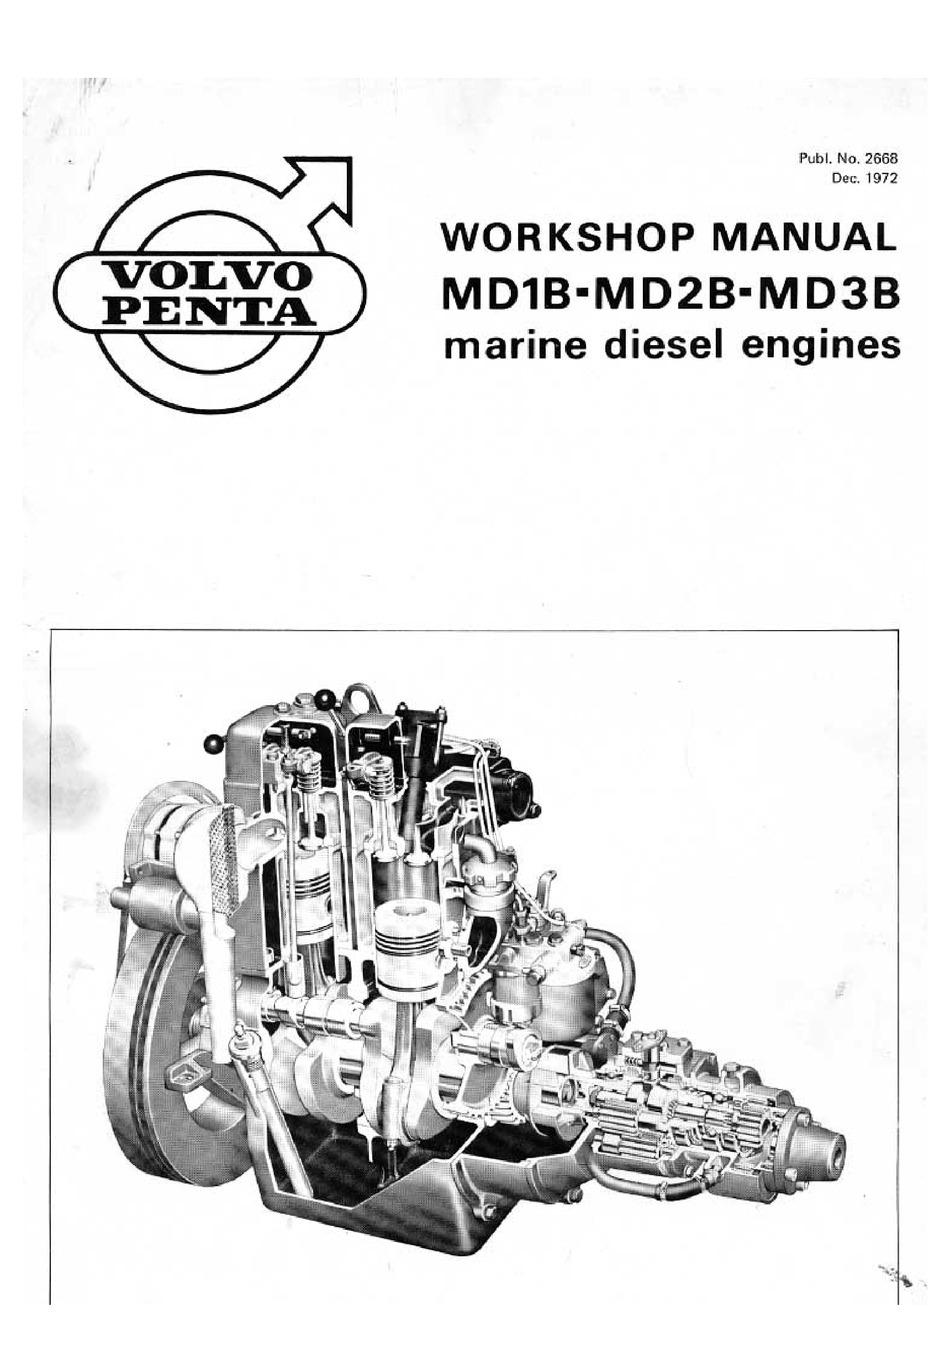 VOLVO PENTA MD1B WORKSHOP MANUAL Pdf Download | ManualsLib | Volvo Penta Ms2 Wiring Diagram |  | ManualsLib